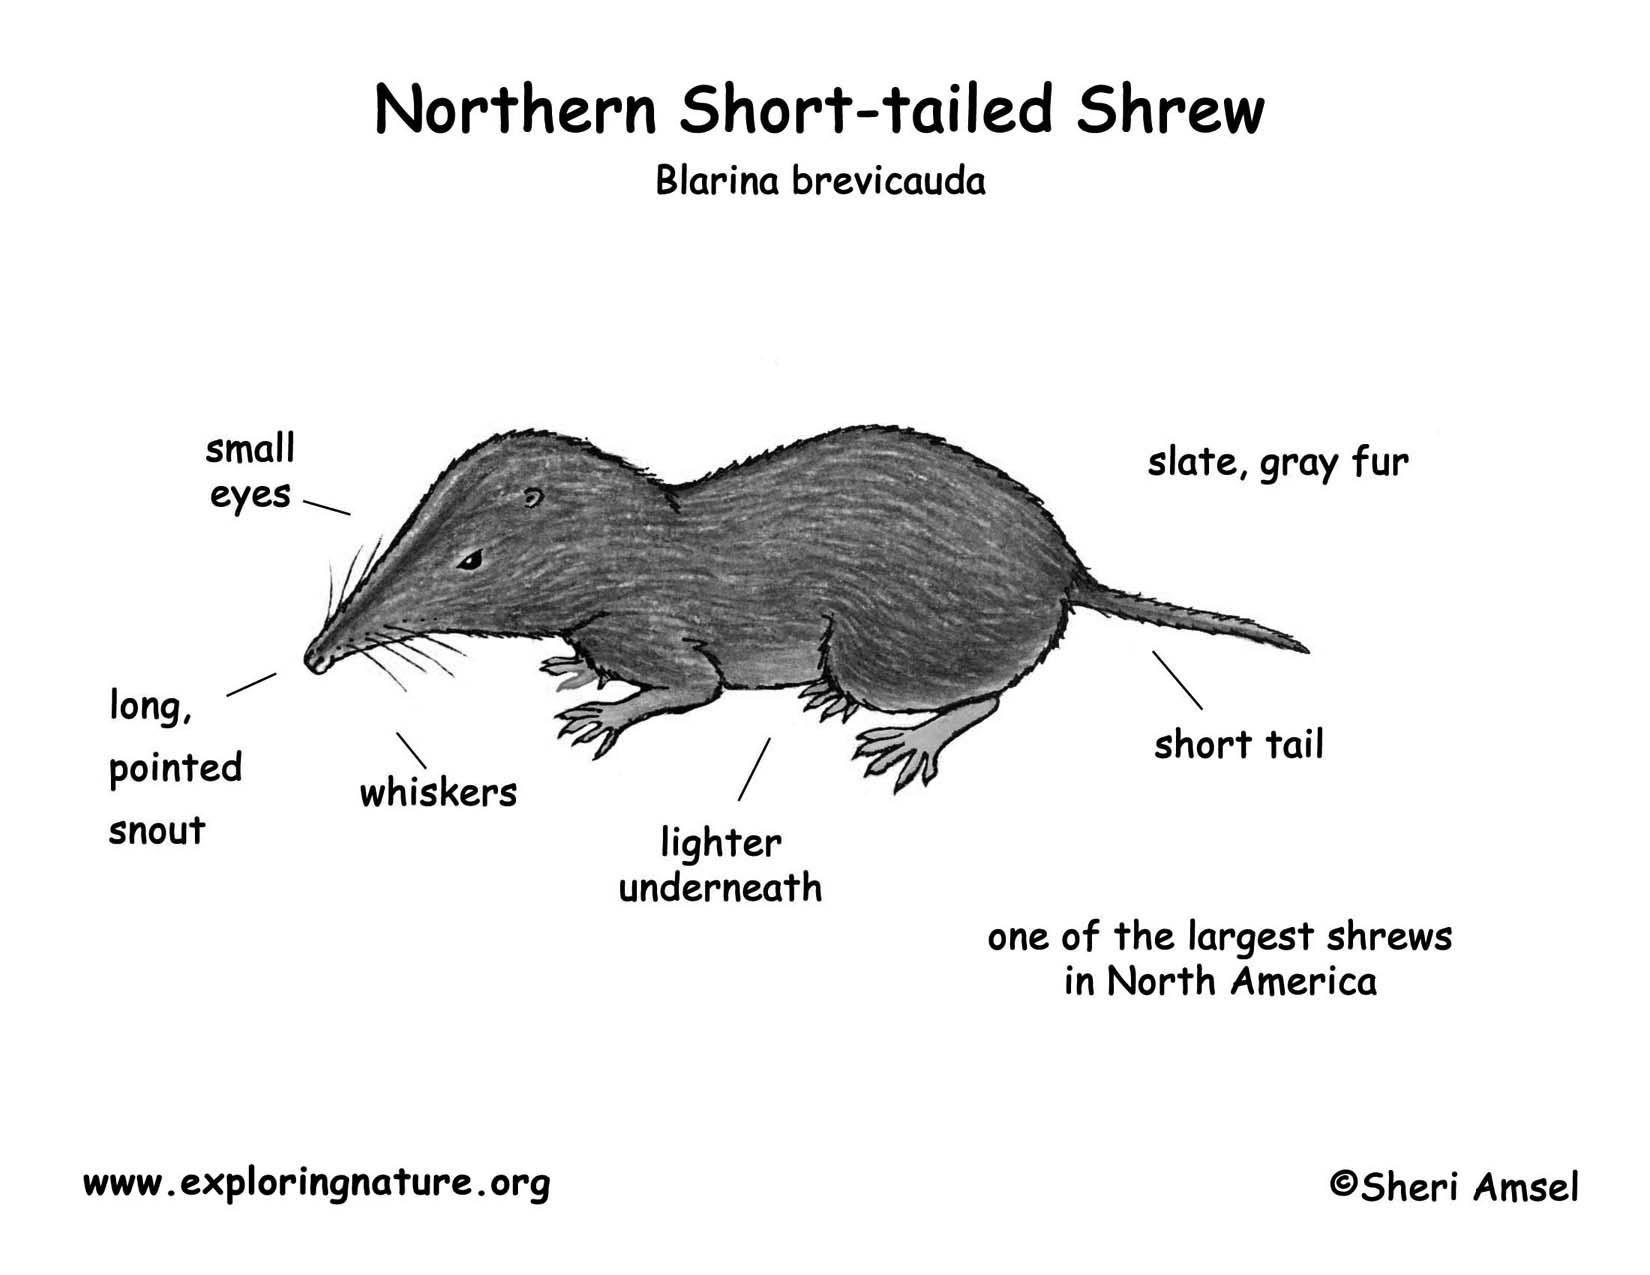 Shrew